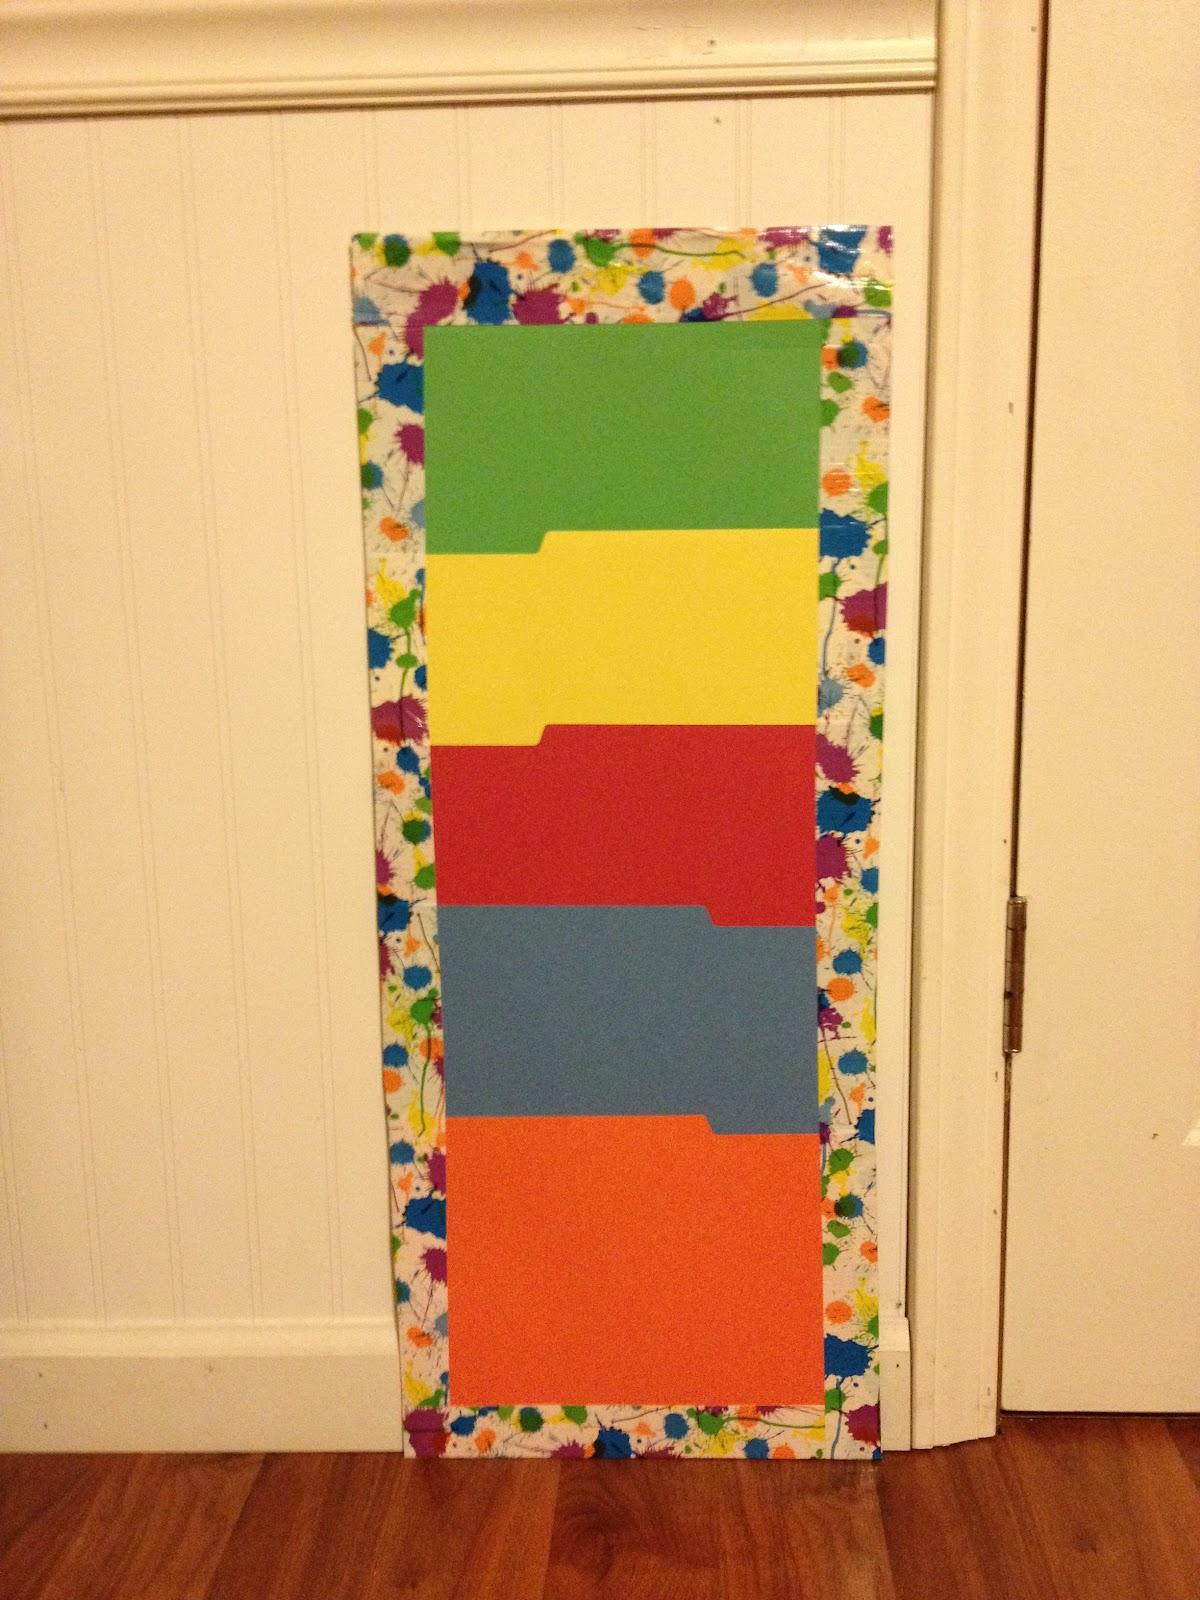 diy hanging file folders - Tulum.smsender.co